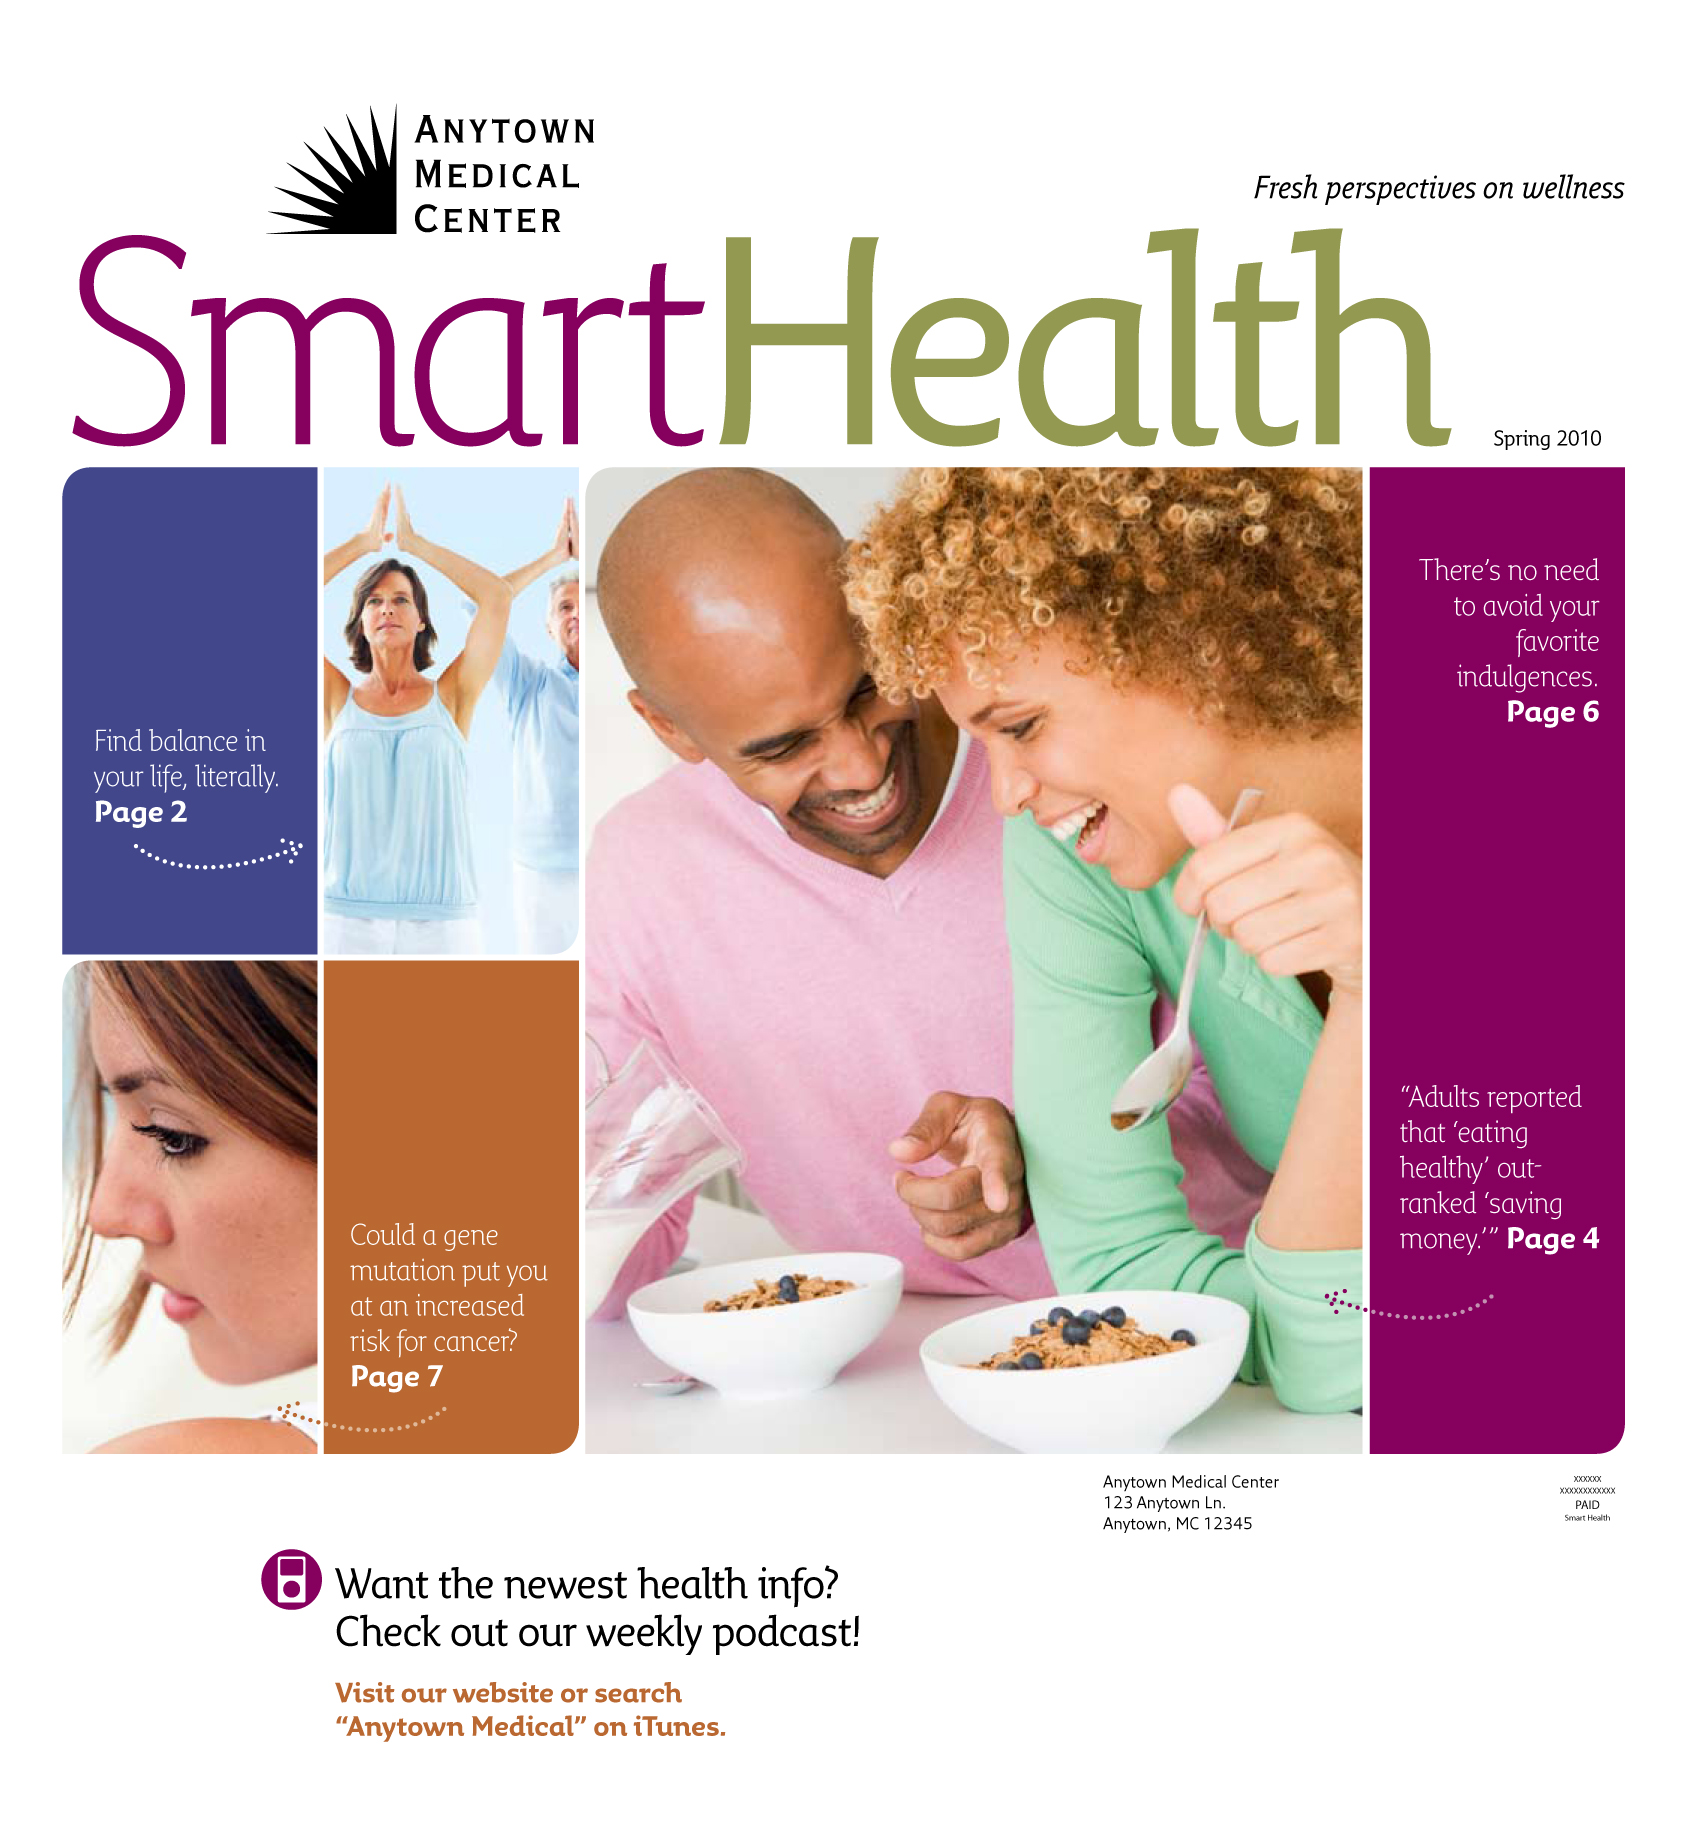 SmartHealth magazine refresh for 2010, cover | LH Portfolio Refresh Magazine